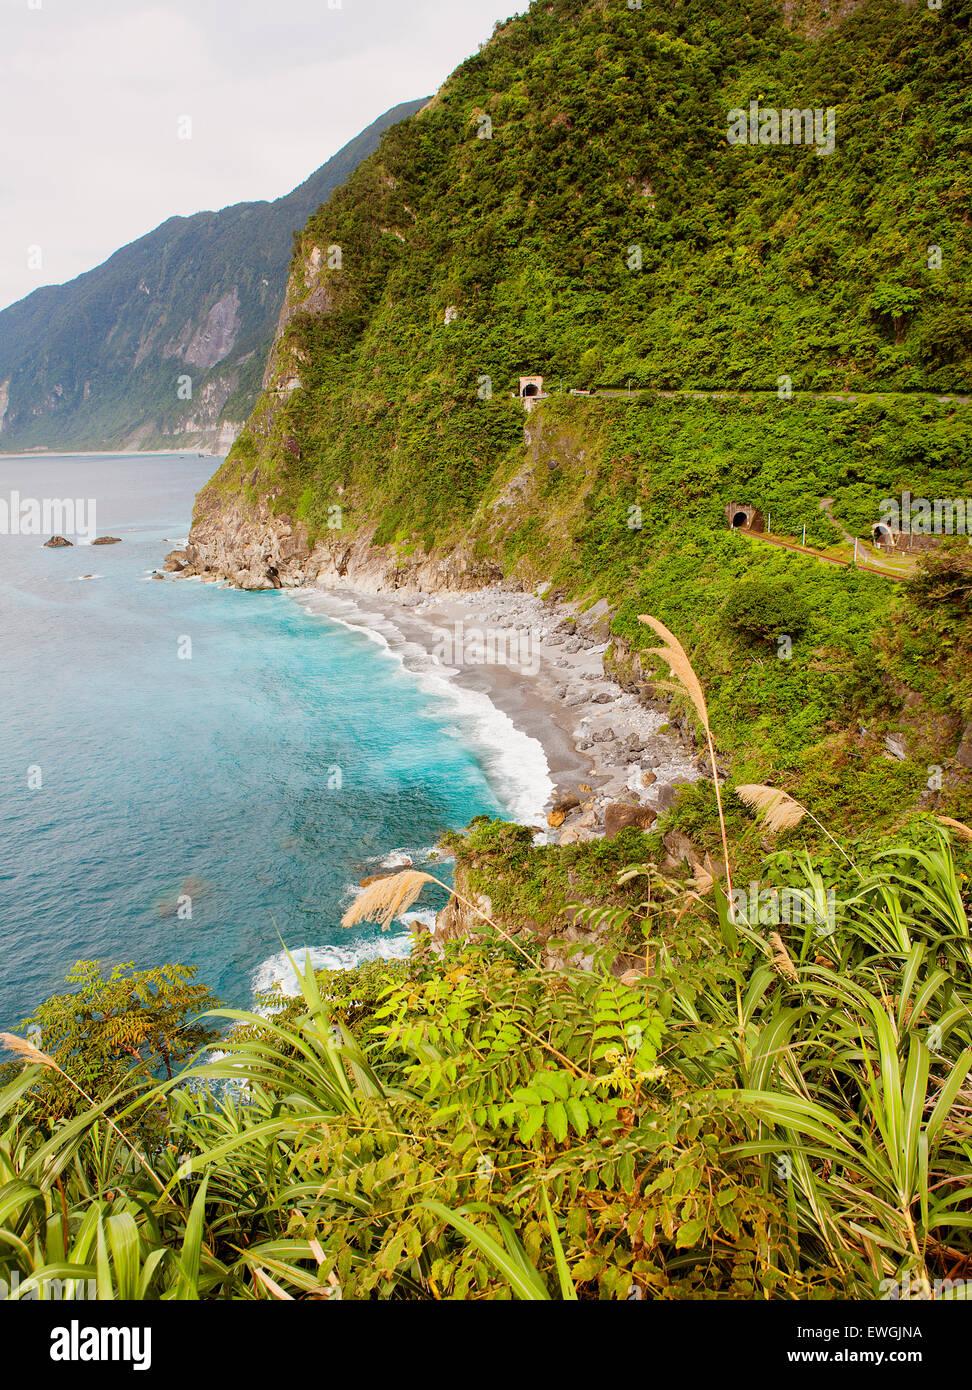 A view of the coast along Su-hua Highway, along the Huide Trail near Taroko Gorge Taiwan - Stock Image